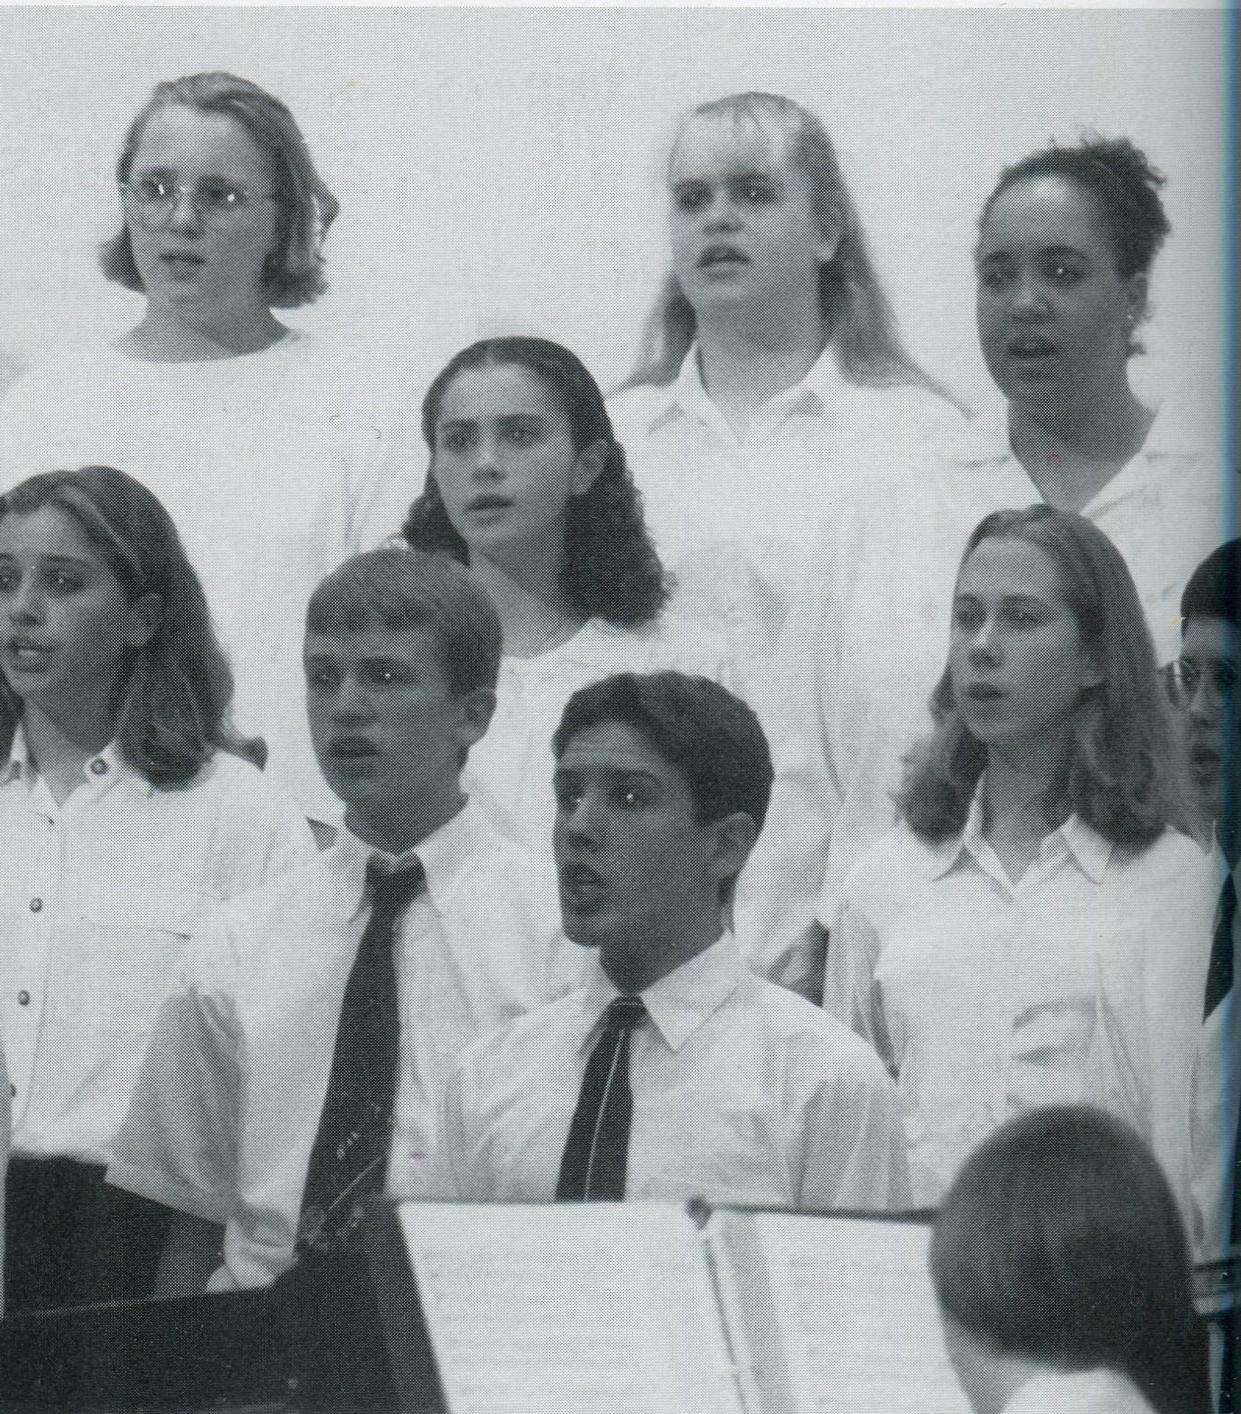 1991 Choir Performance